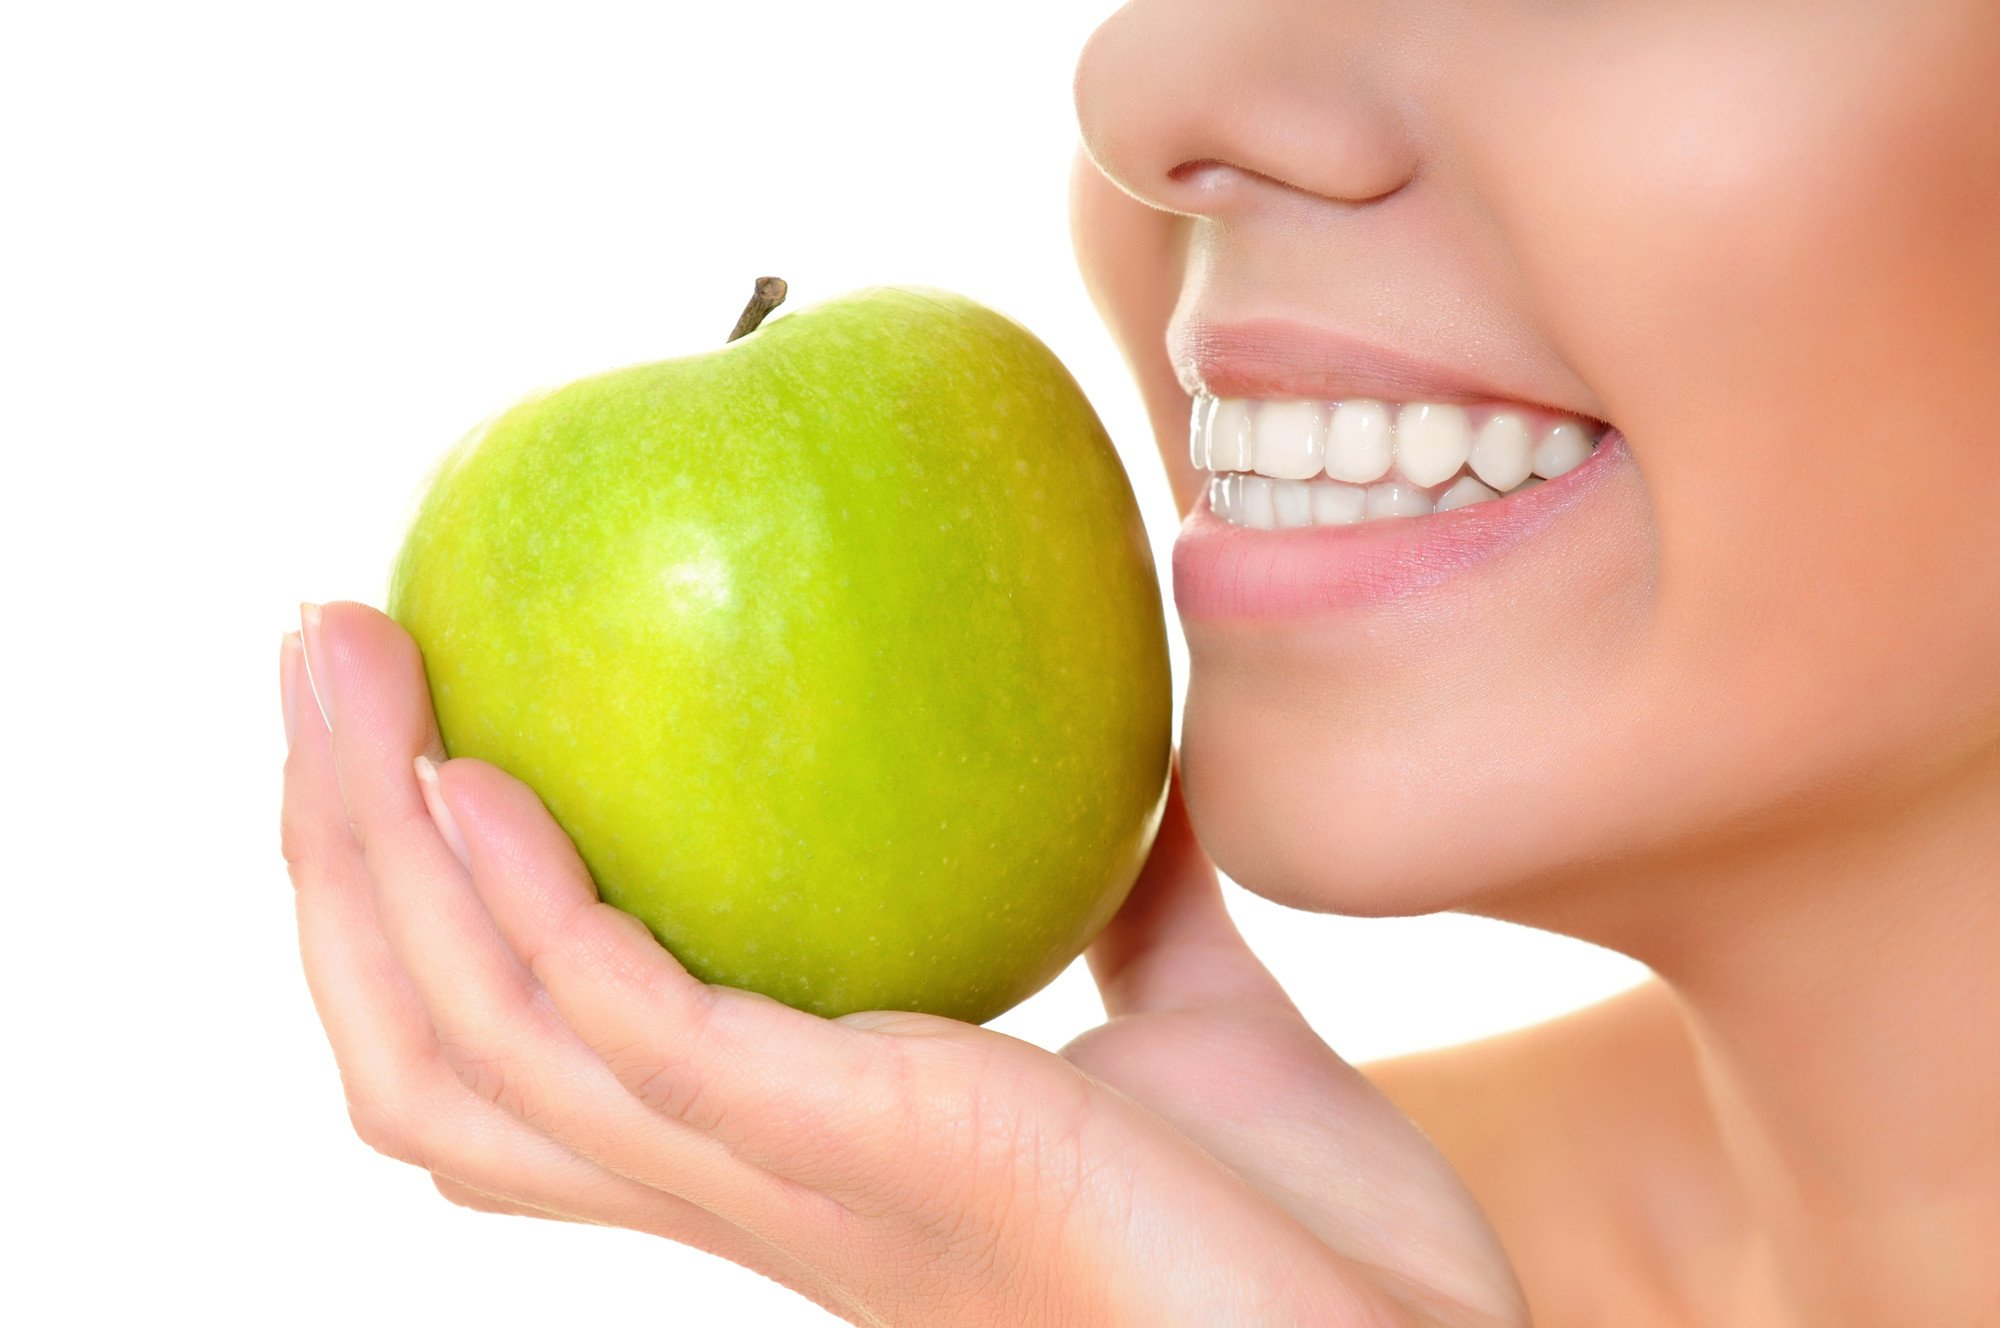 A girl holding an apple